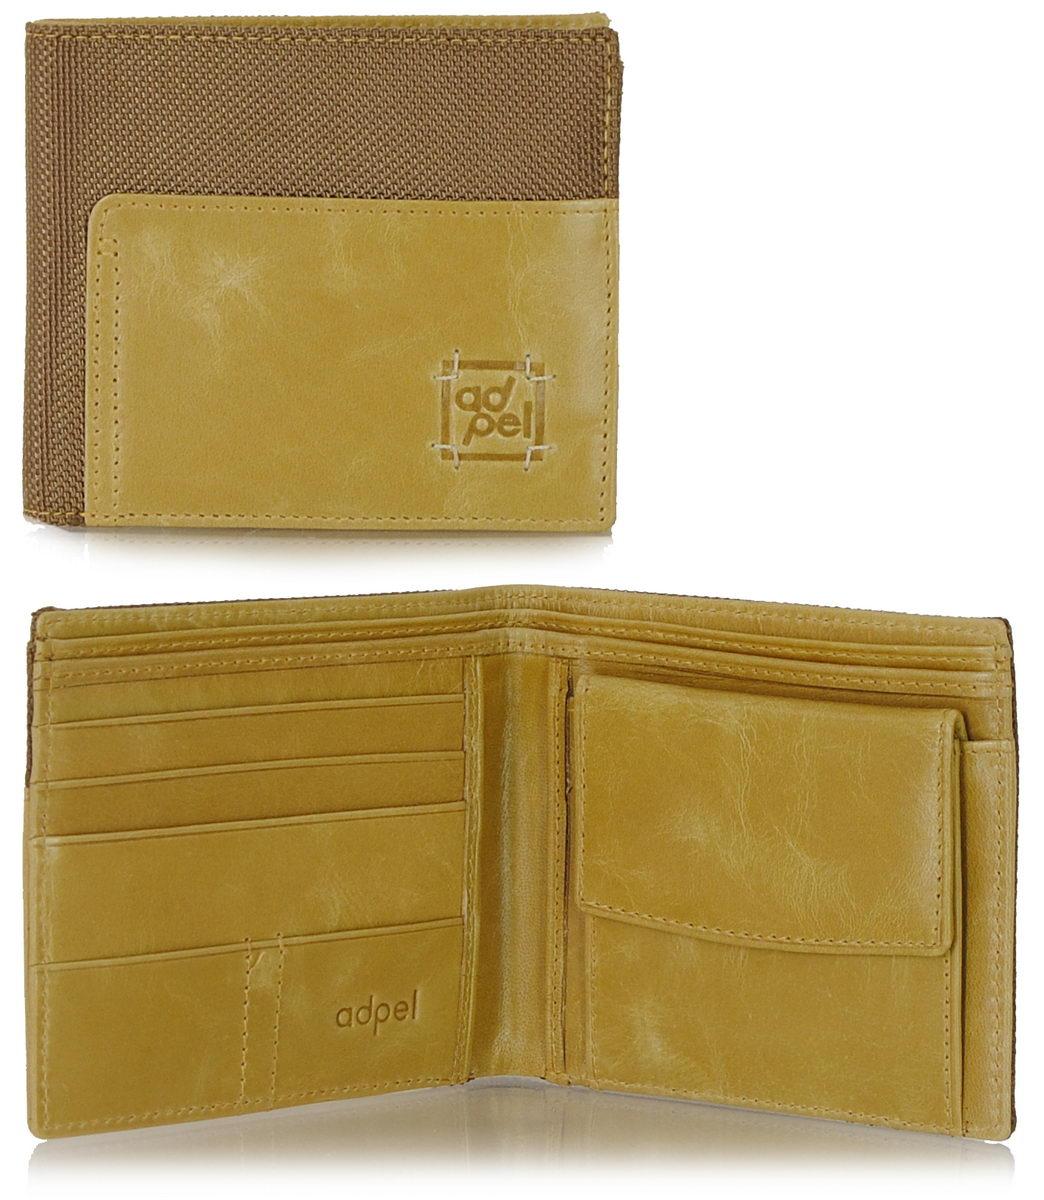 small men's wallet